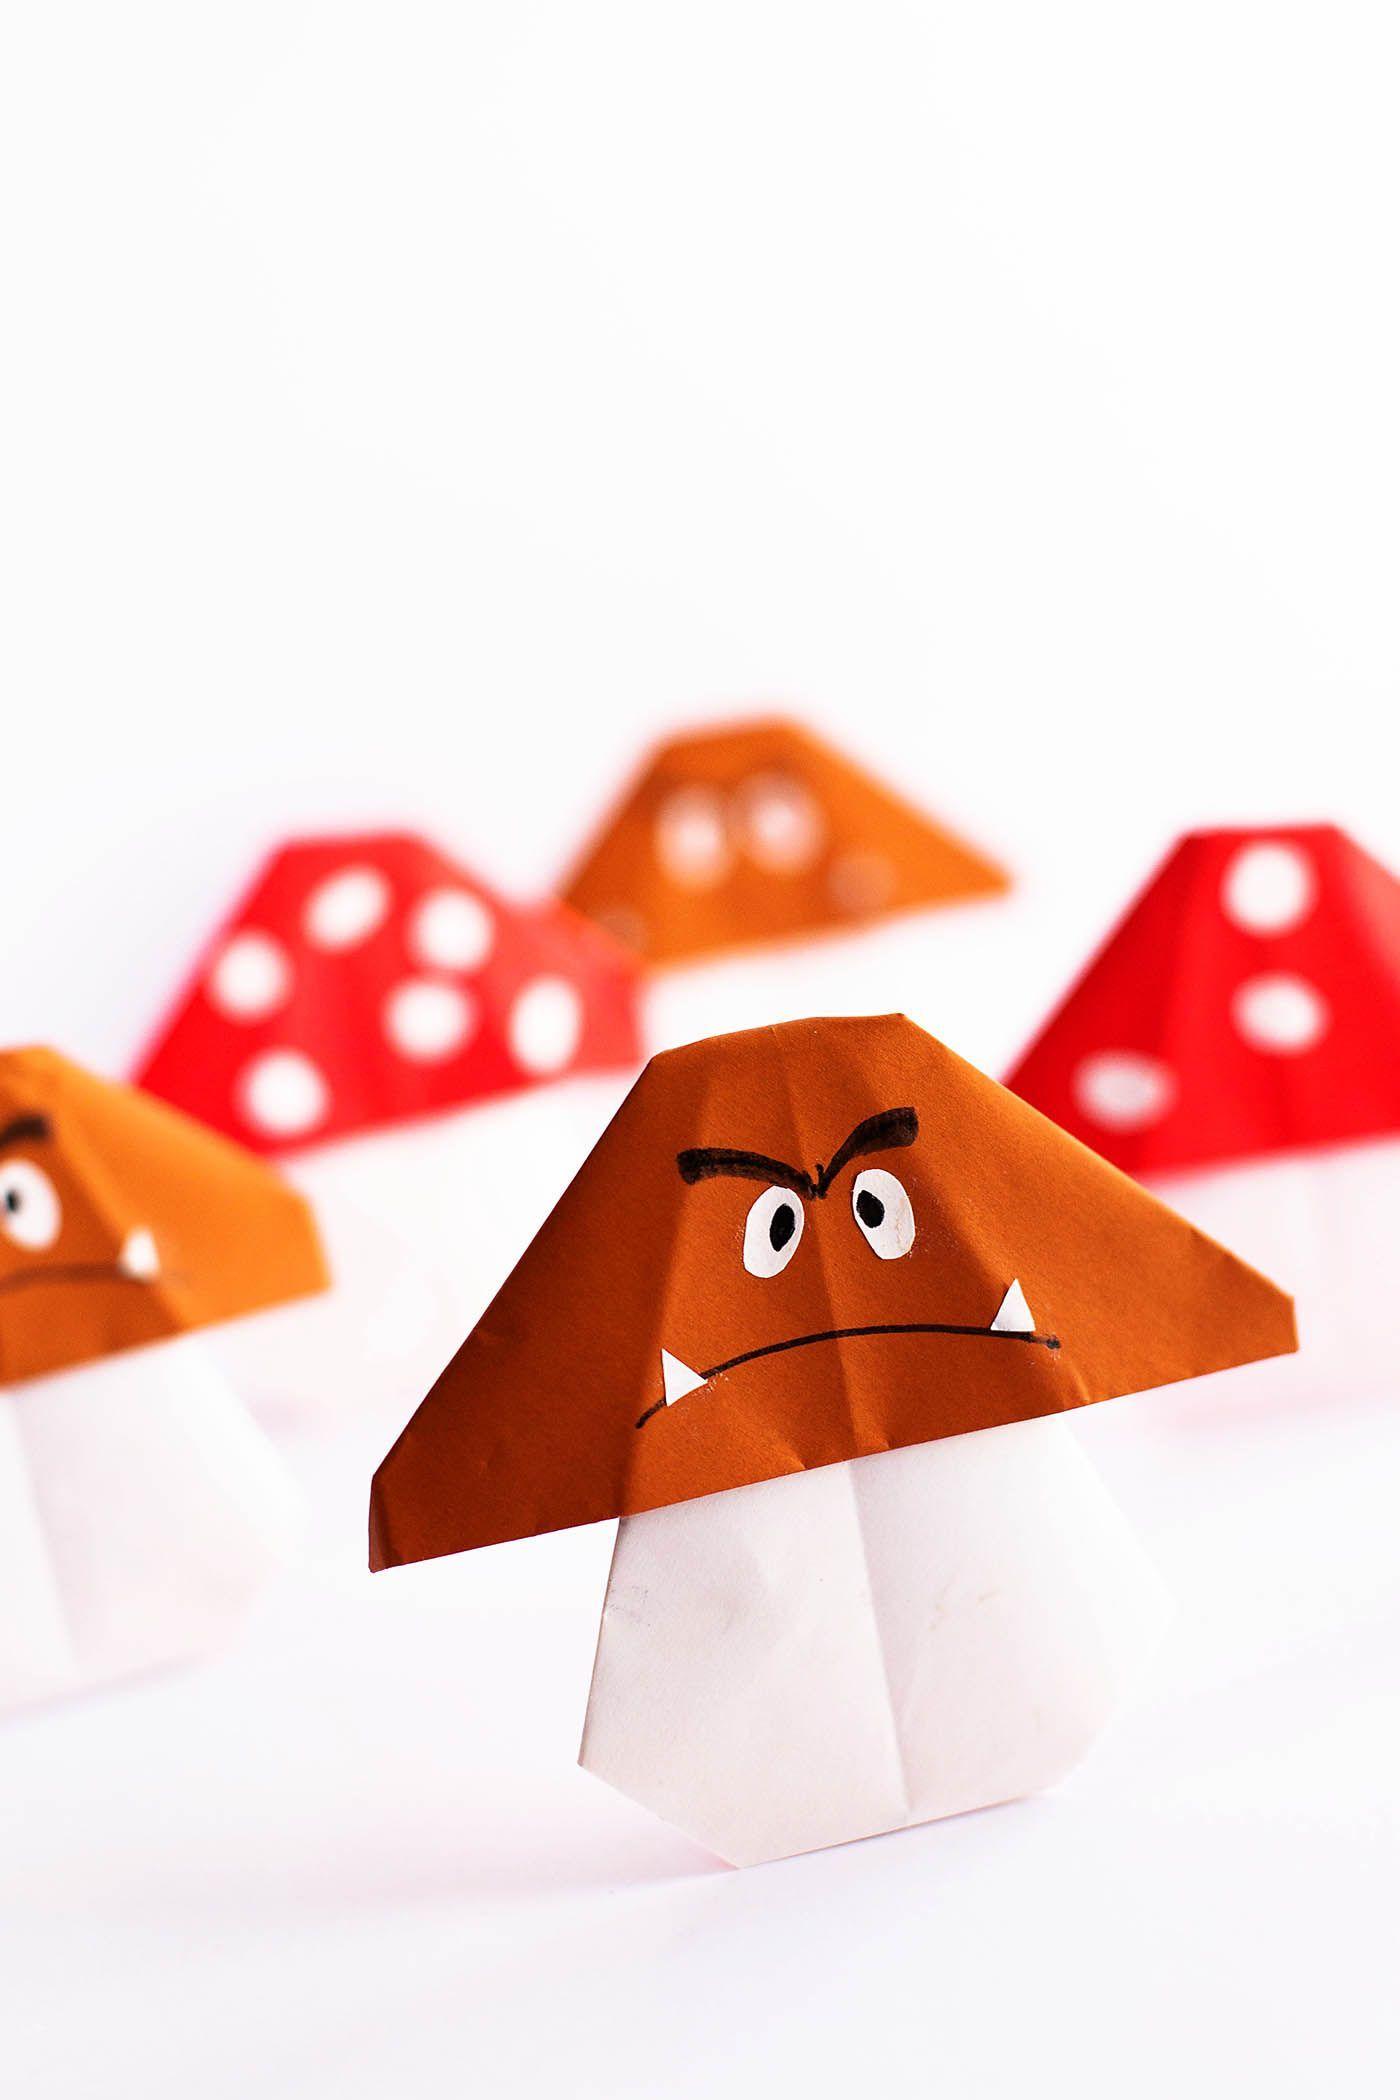 Origami Easy Panosundaki Pin